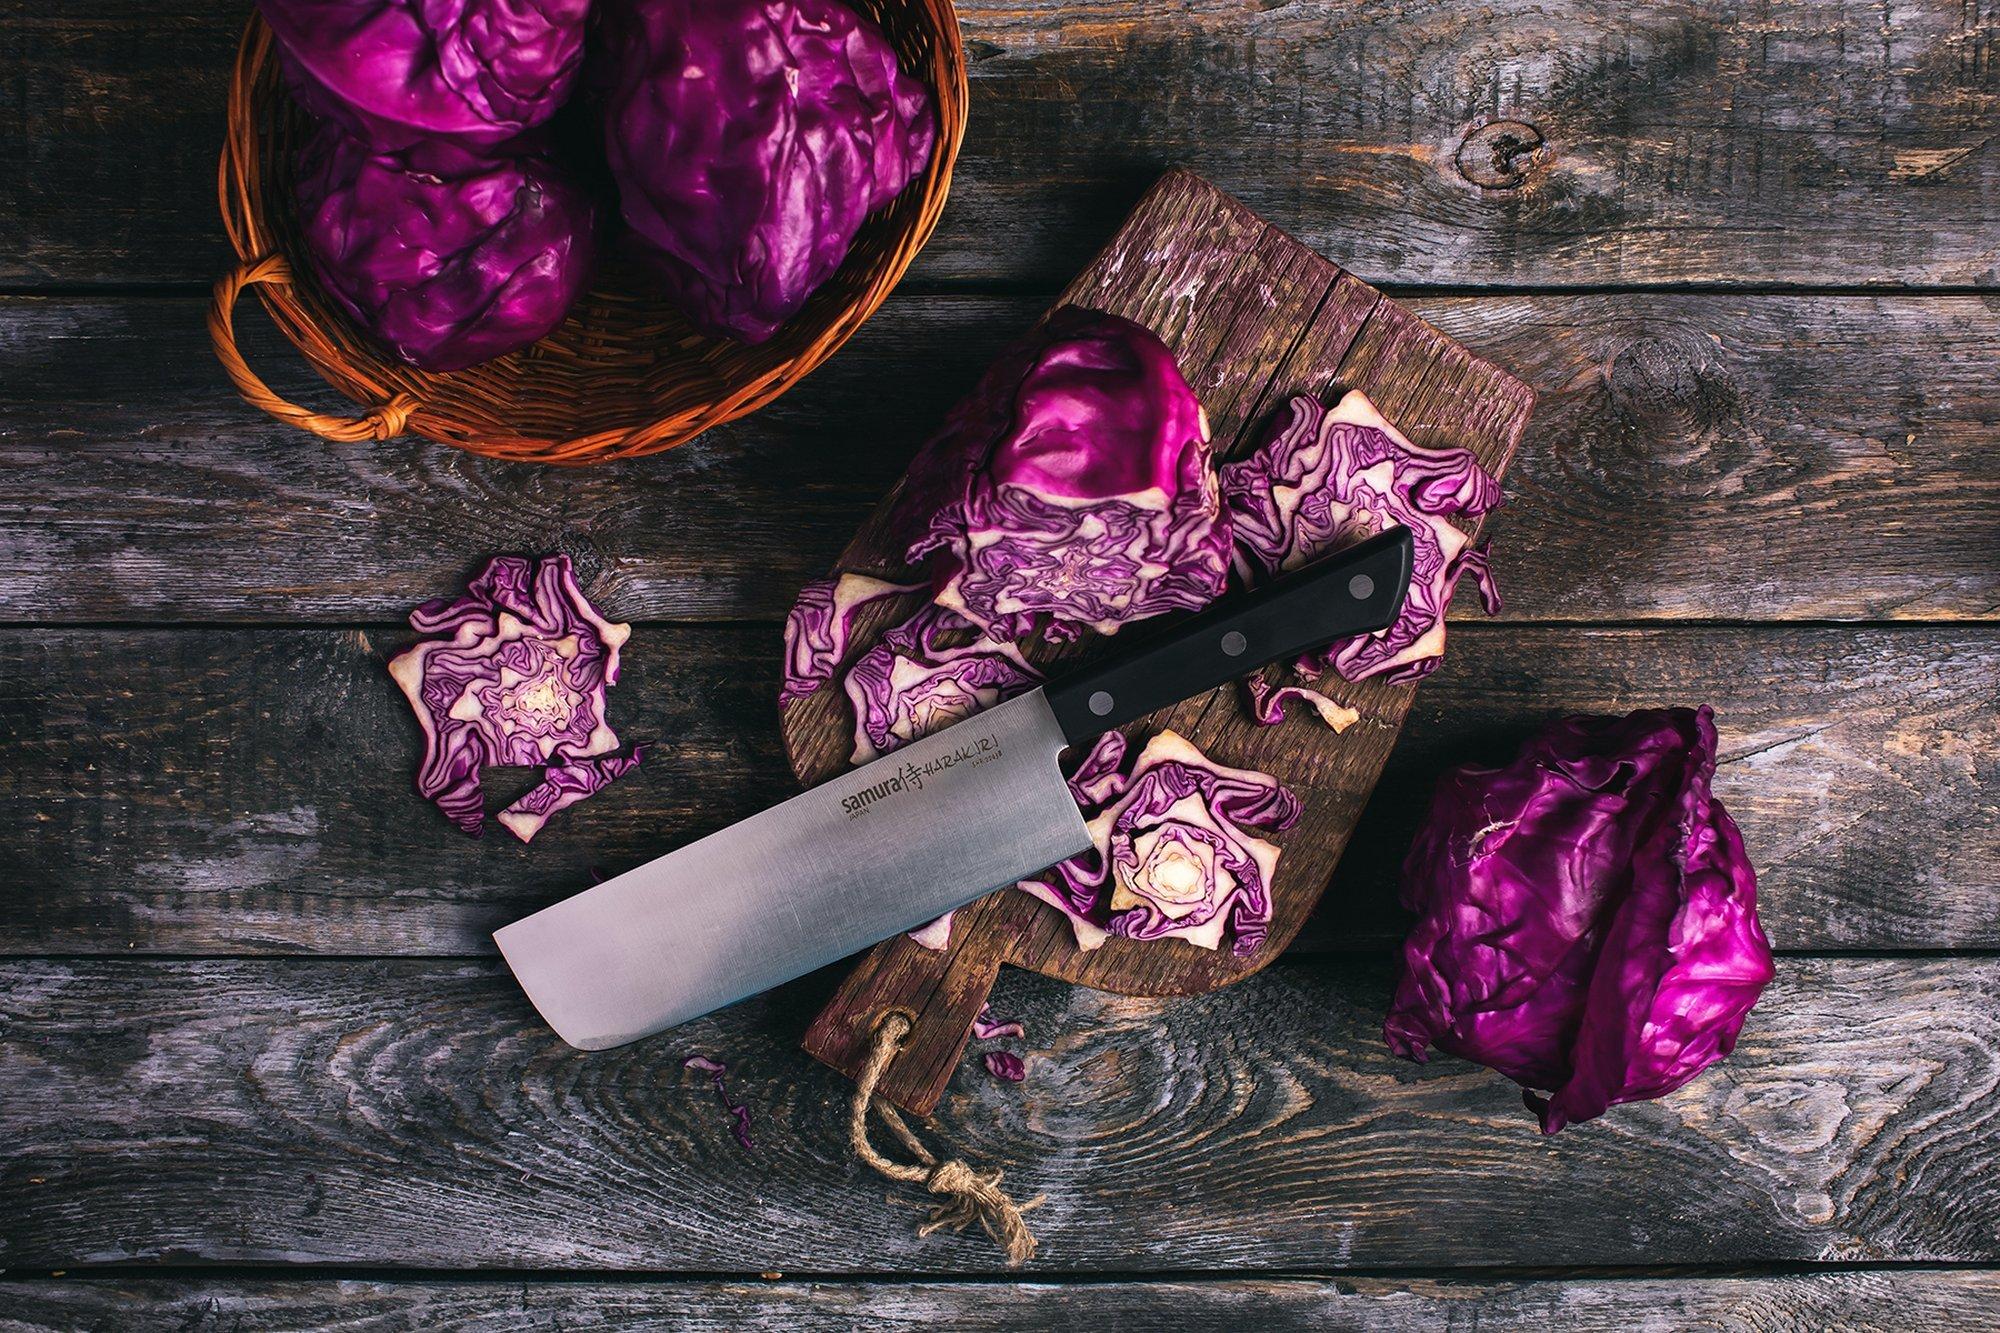 Фото 9 - Нож кухонный овощной накири Samura